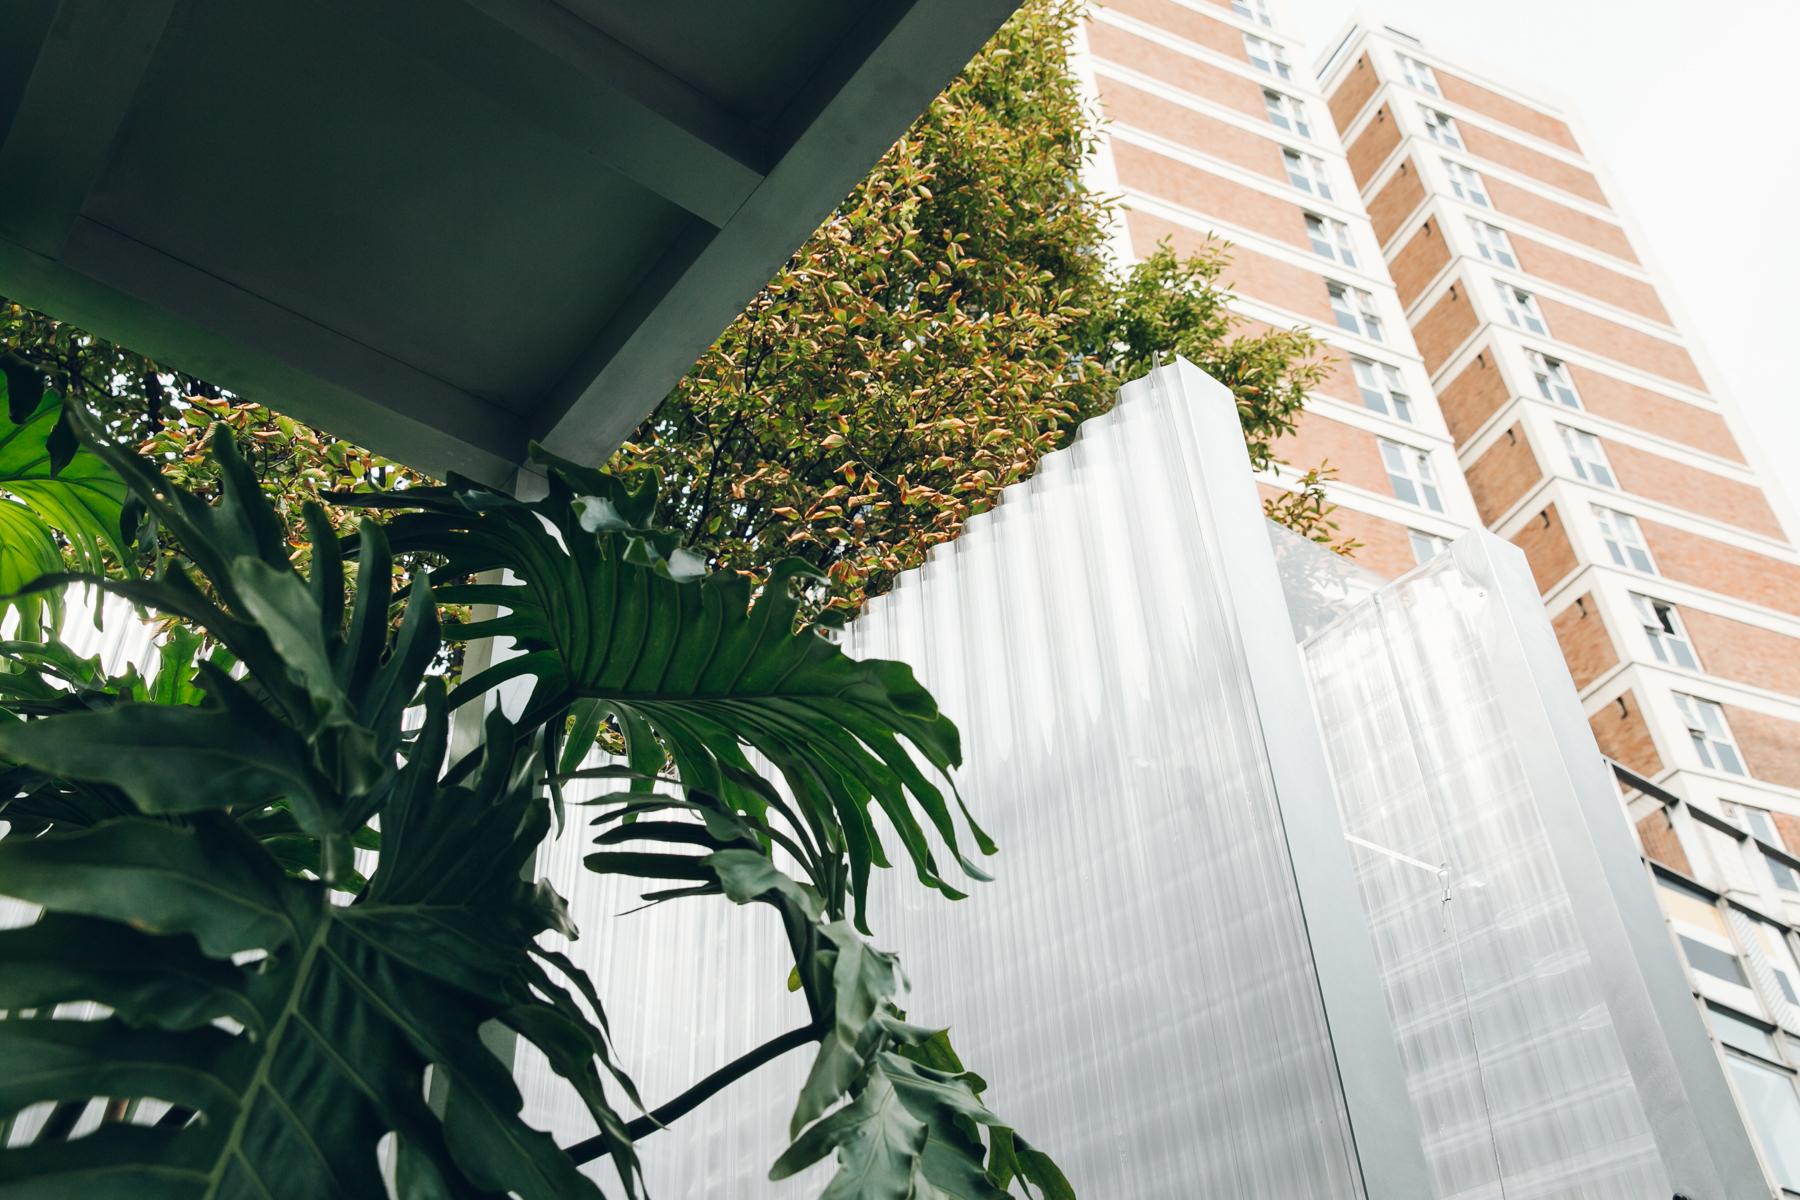 Plant installation in London